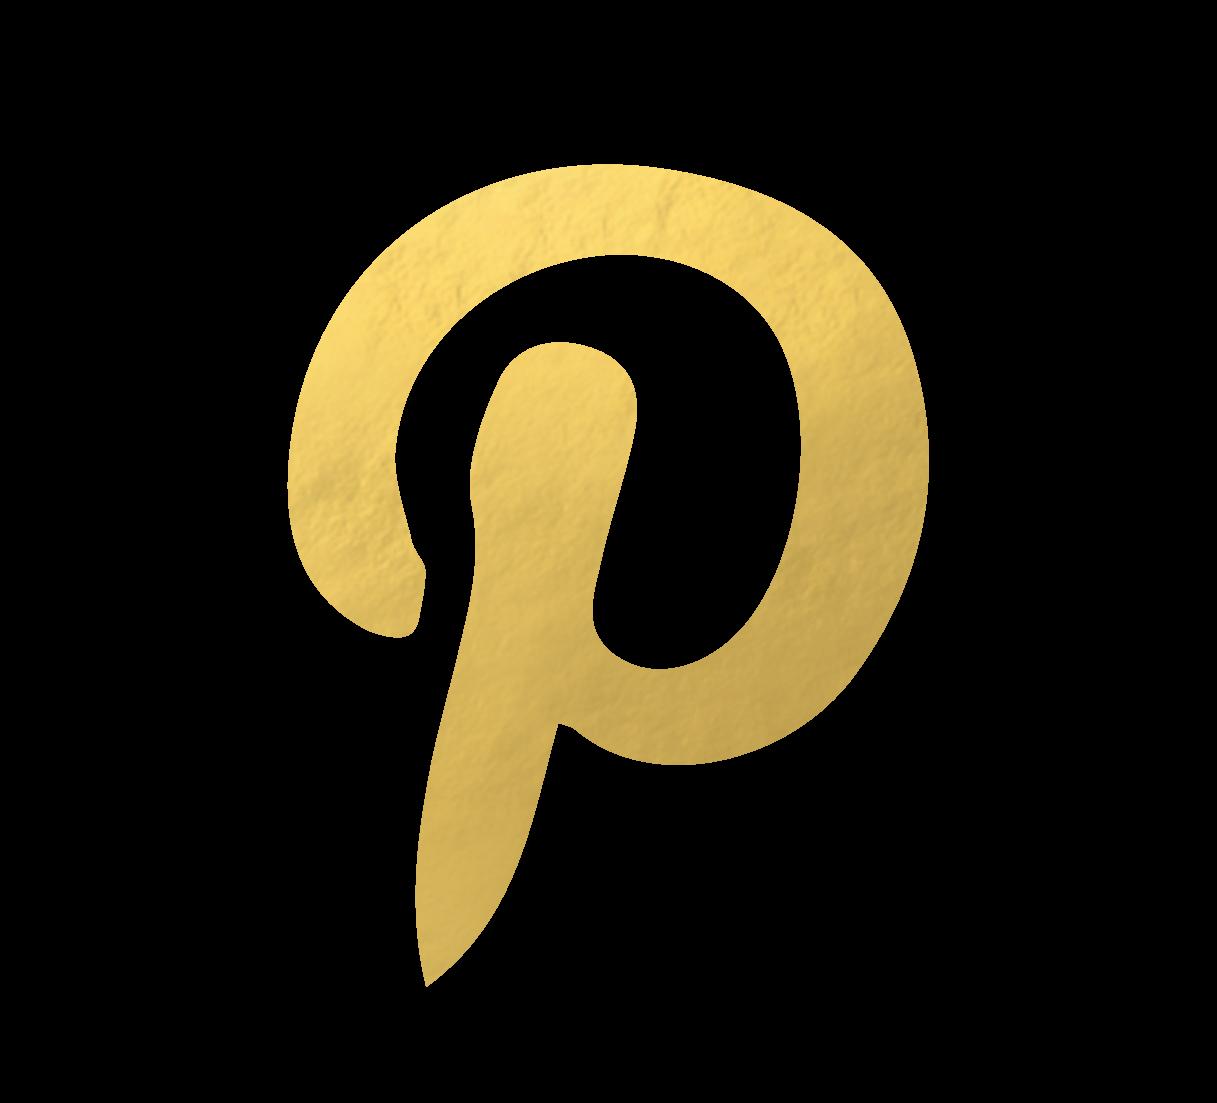 gold-foil-social-media-11-.png